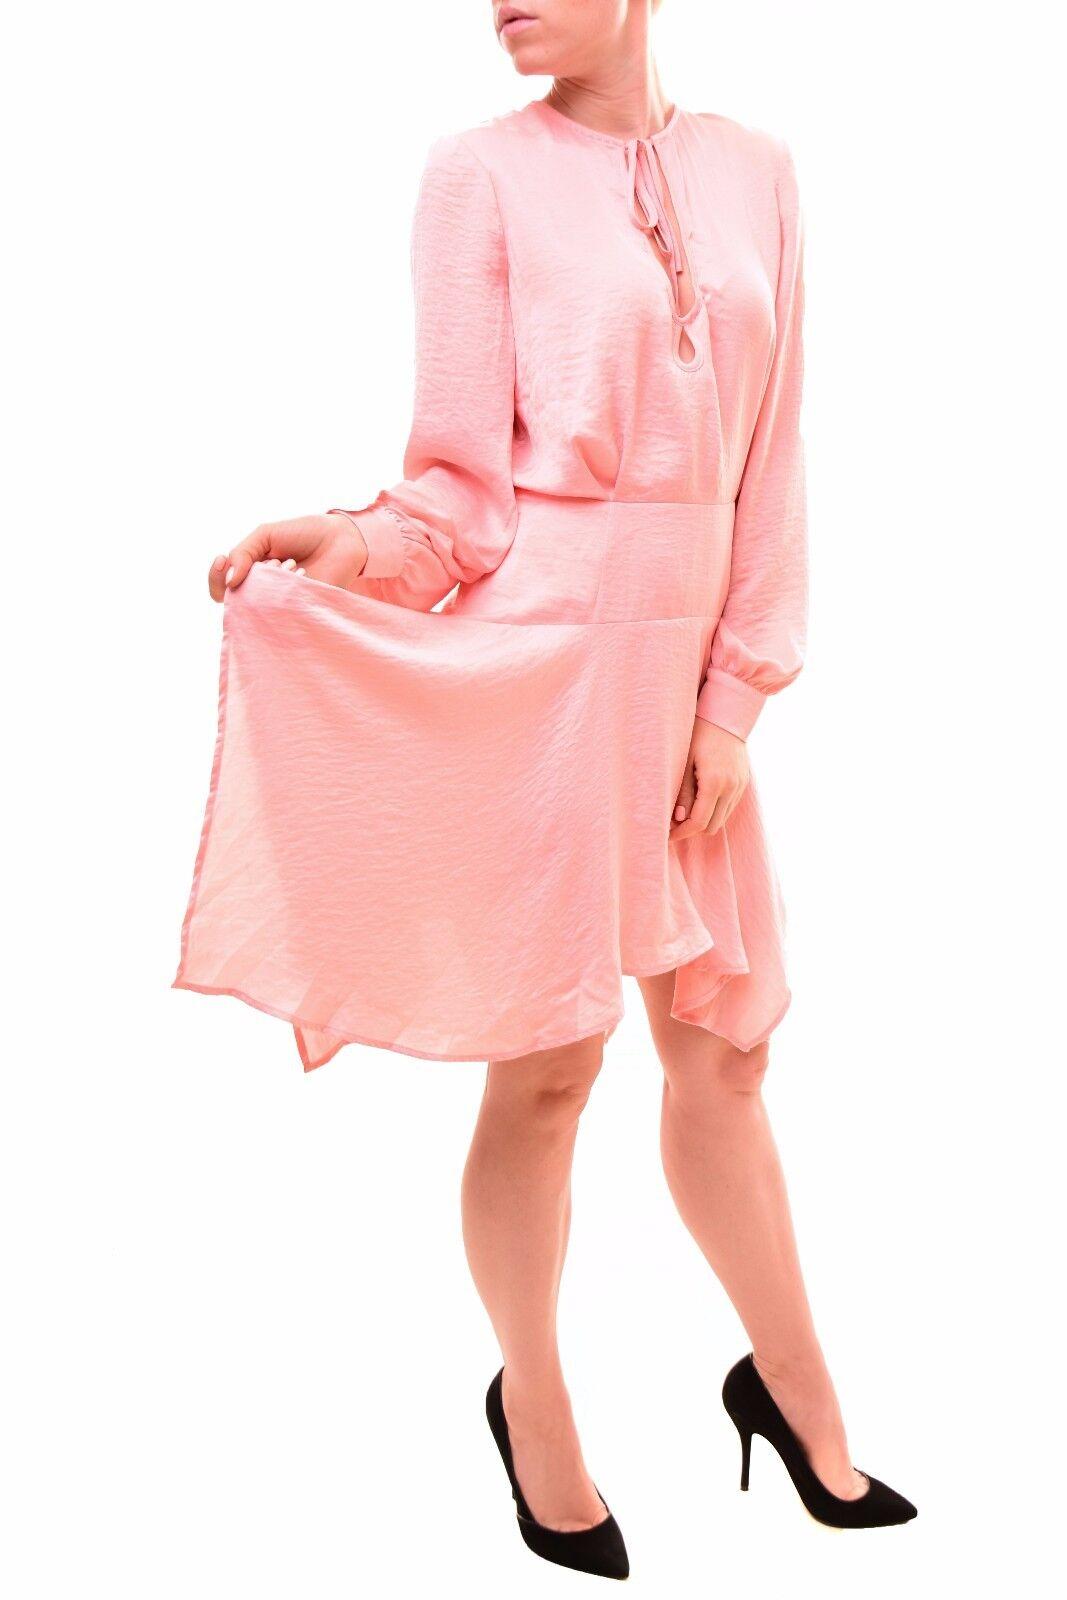 Finders Keepers Romantic Wonderful Huntr L S  Dress Blaush S RRP  BCF710